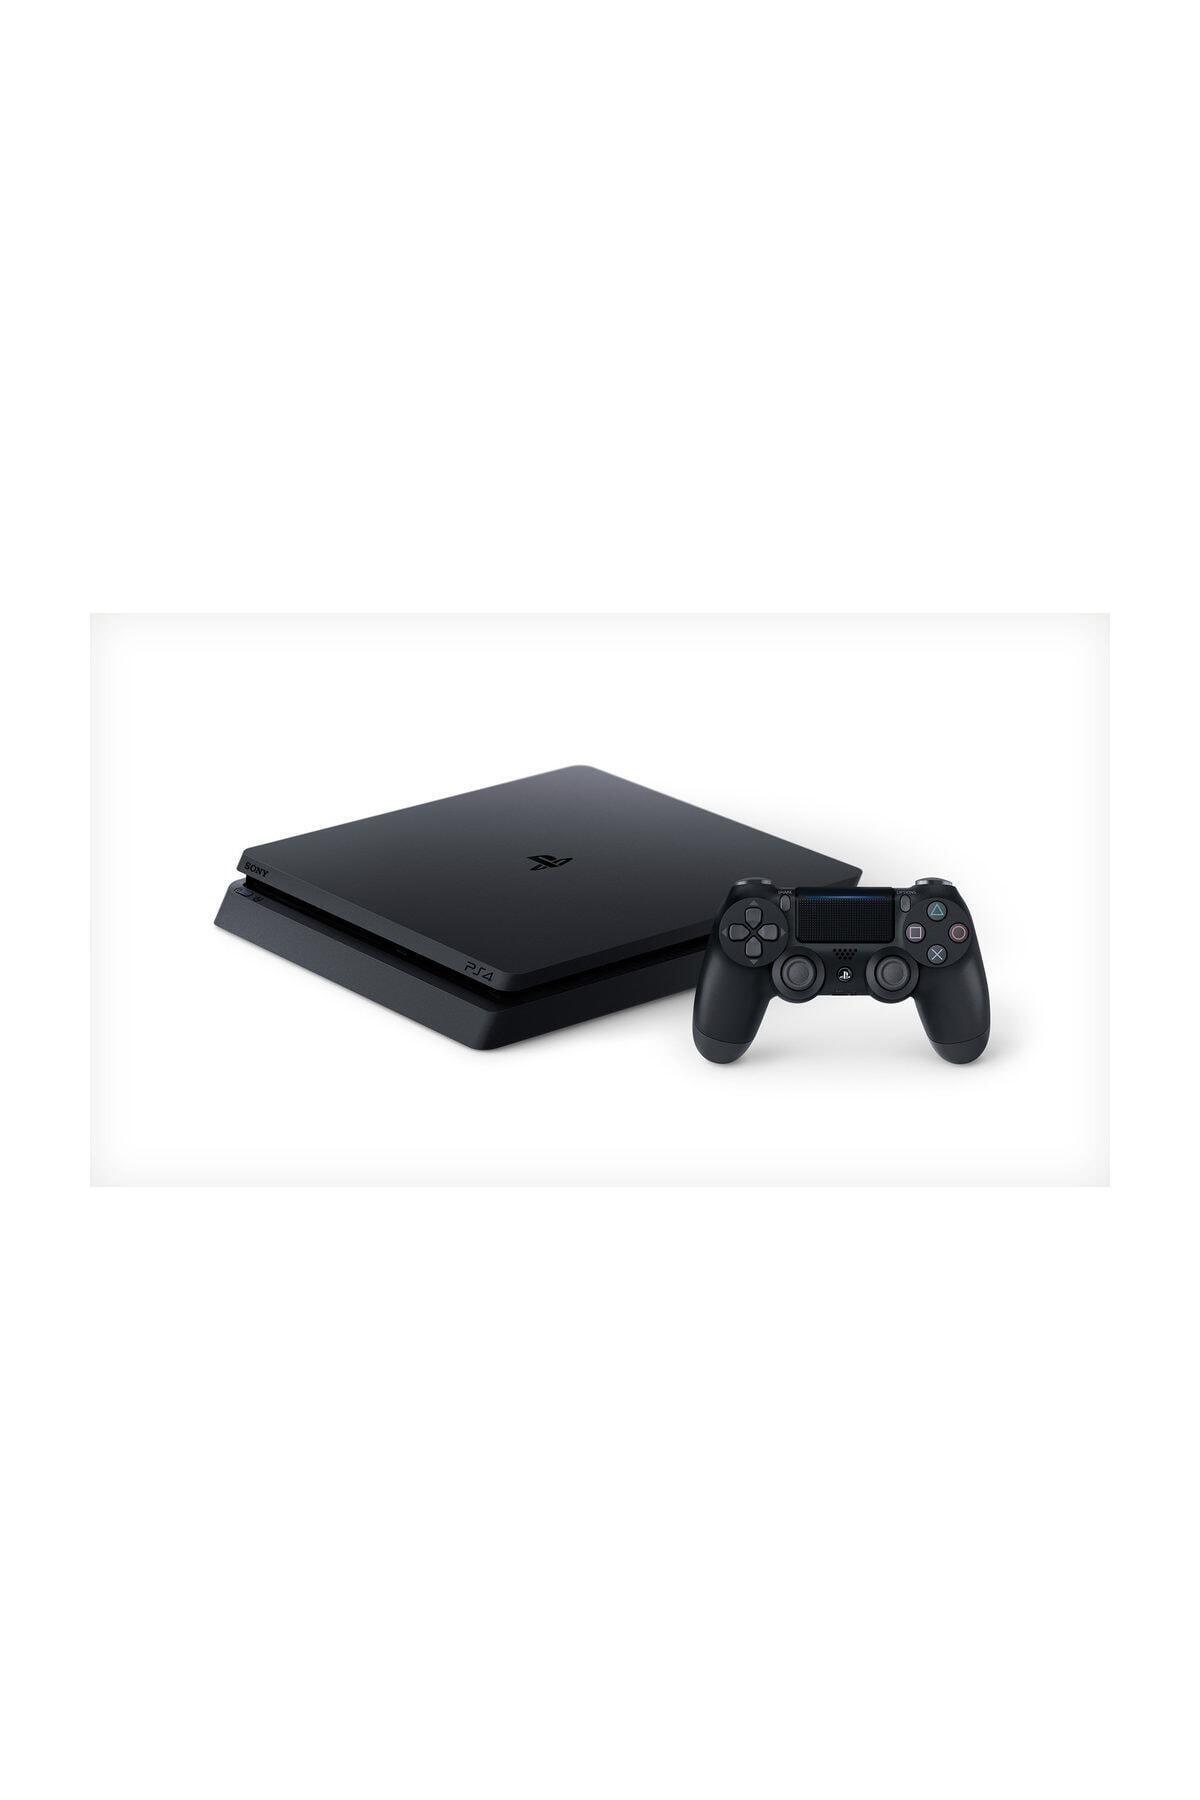 Sony Playstation 4 Slim 500 Gb + Gta V + Days Gone + God Of War + Fortnite + Psn (Eurasia Garantili) 2